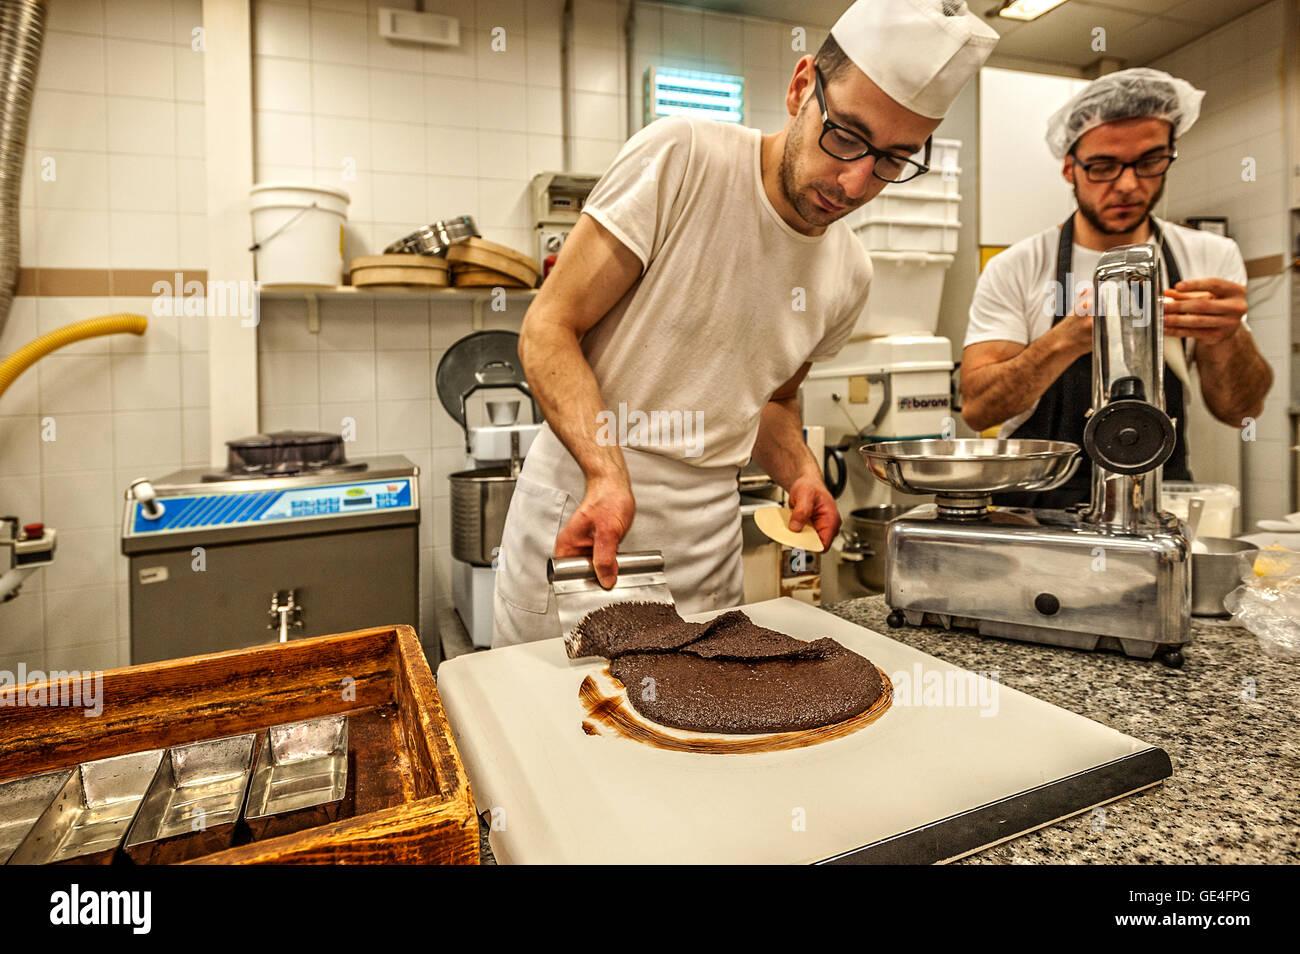 Italy Sicily Modica - Dolceria Bonajuto -   Tempering Chocolate Stock Photo